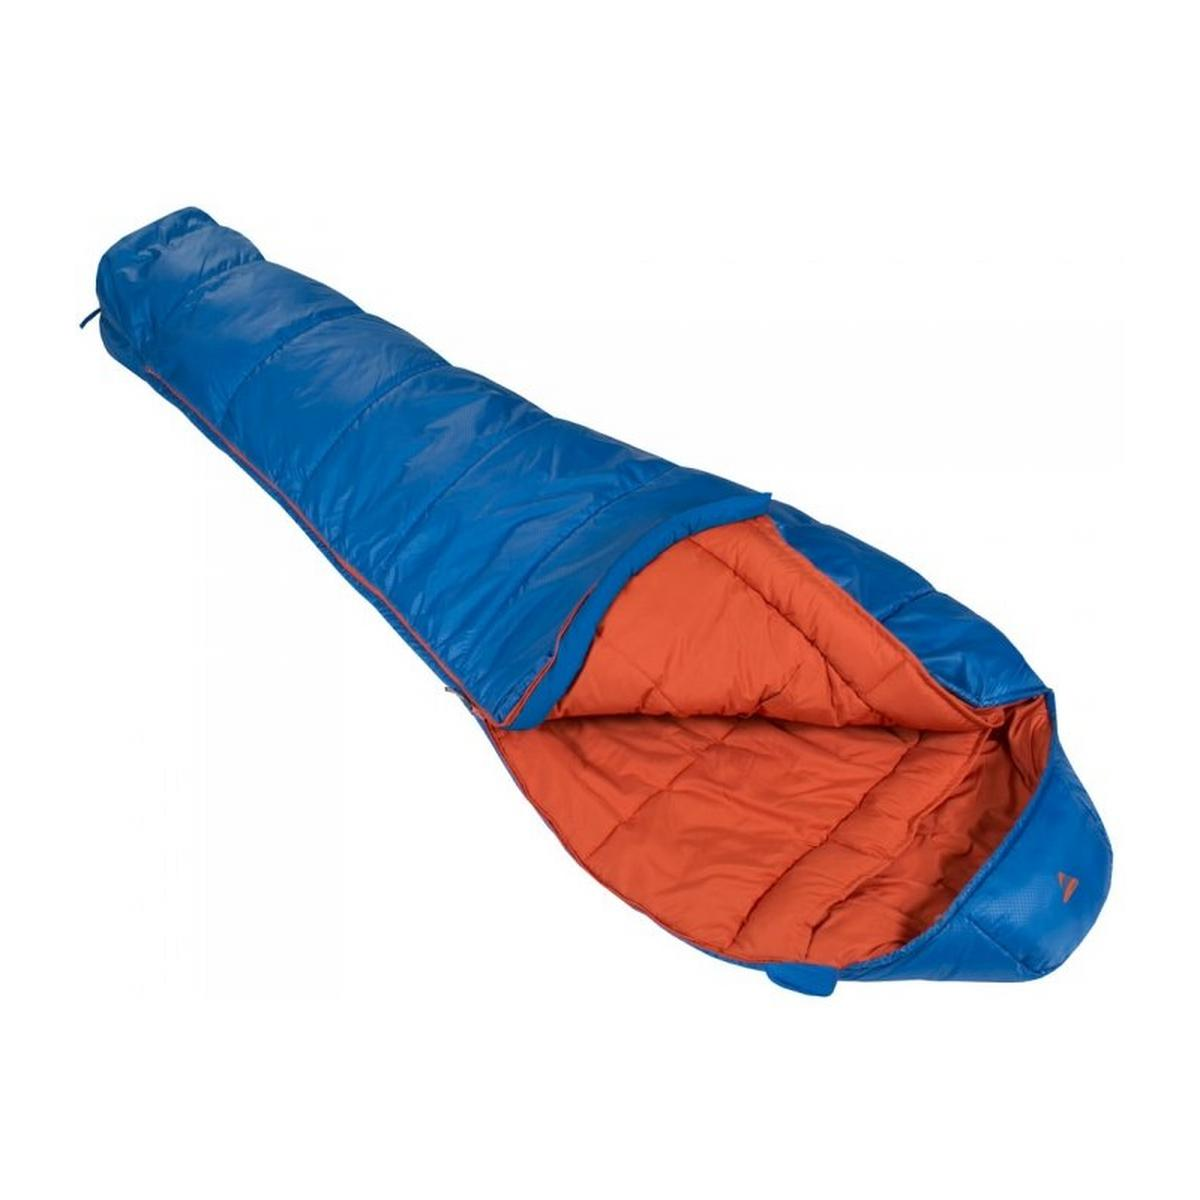 Vango Nitestar Alpha 250 Sleeping Bag - Blue